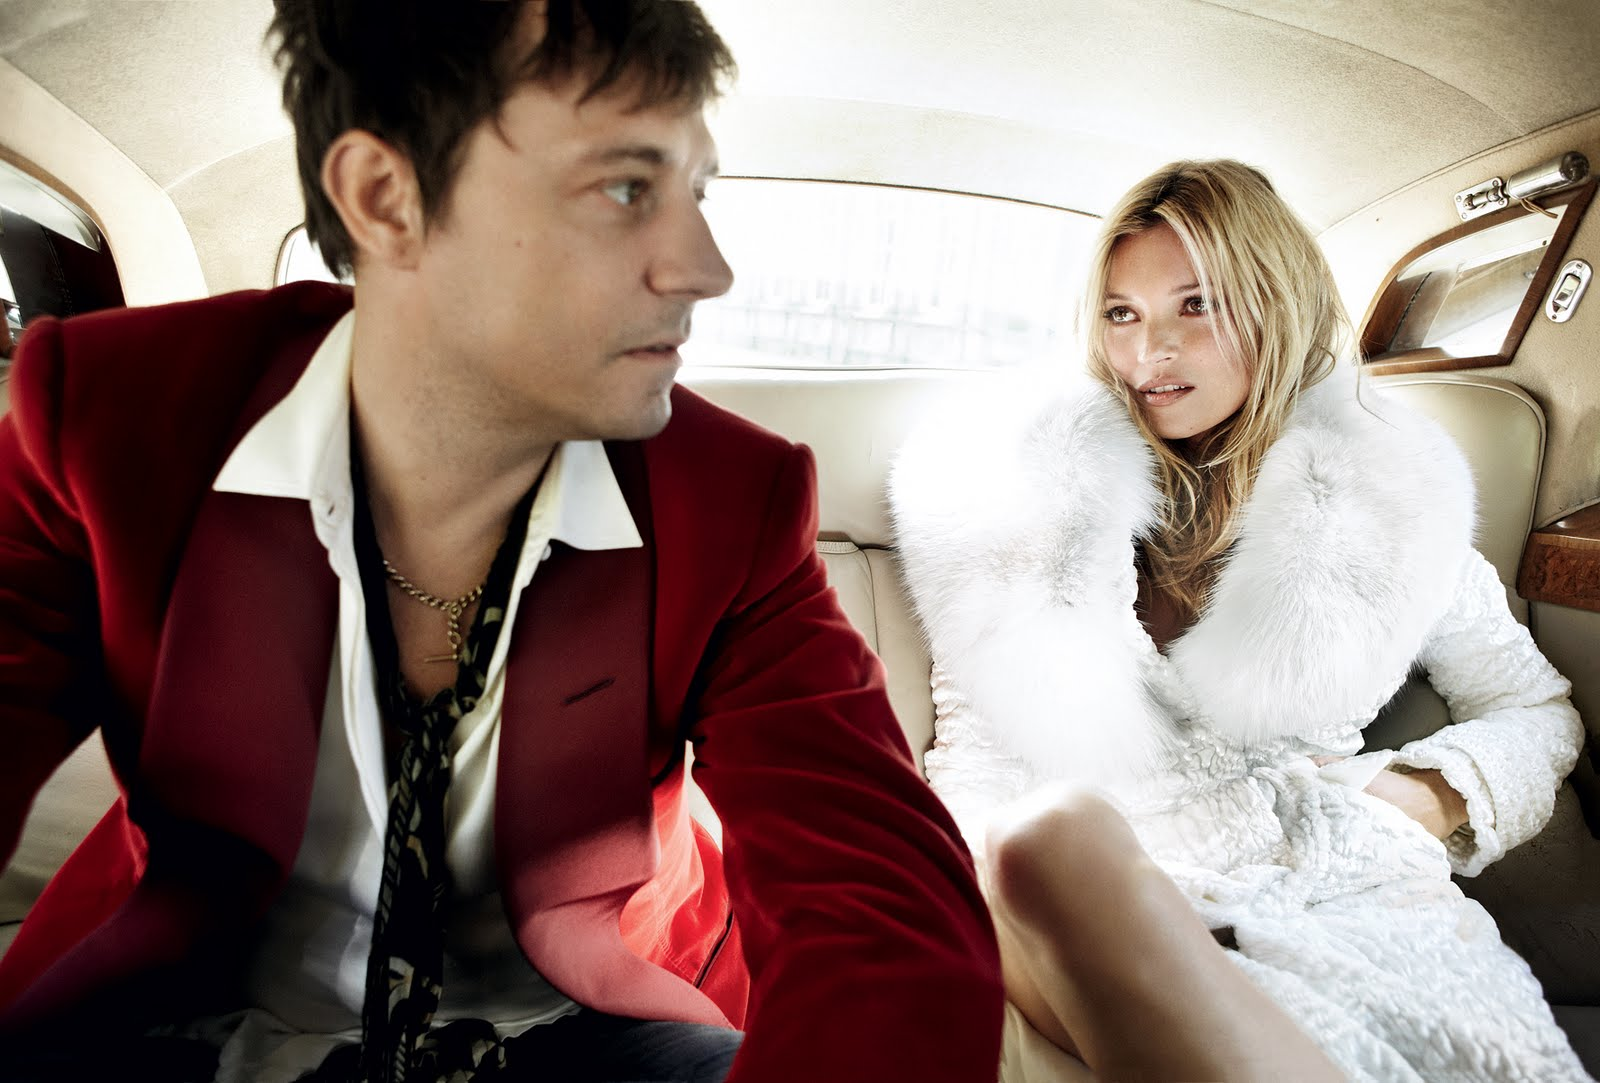 http://2.bp.blogspot.com/-dSwTNh1eKMQ/TlZWGtk7xjI/AAAAAAAABik/anhEaq6R_uY/s1600/la.chica.del.solitario.blog.moda.kate.moss.wedding.jamie.hince.backseat.car.mario.testino.vogue.jpg